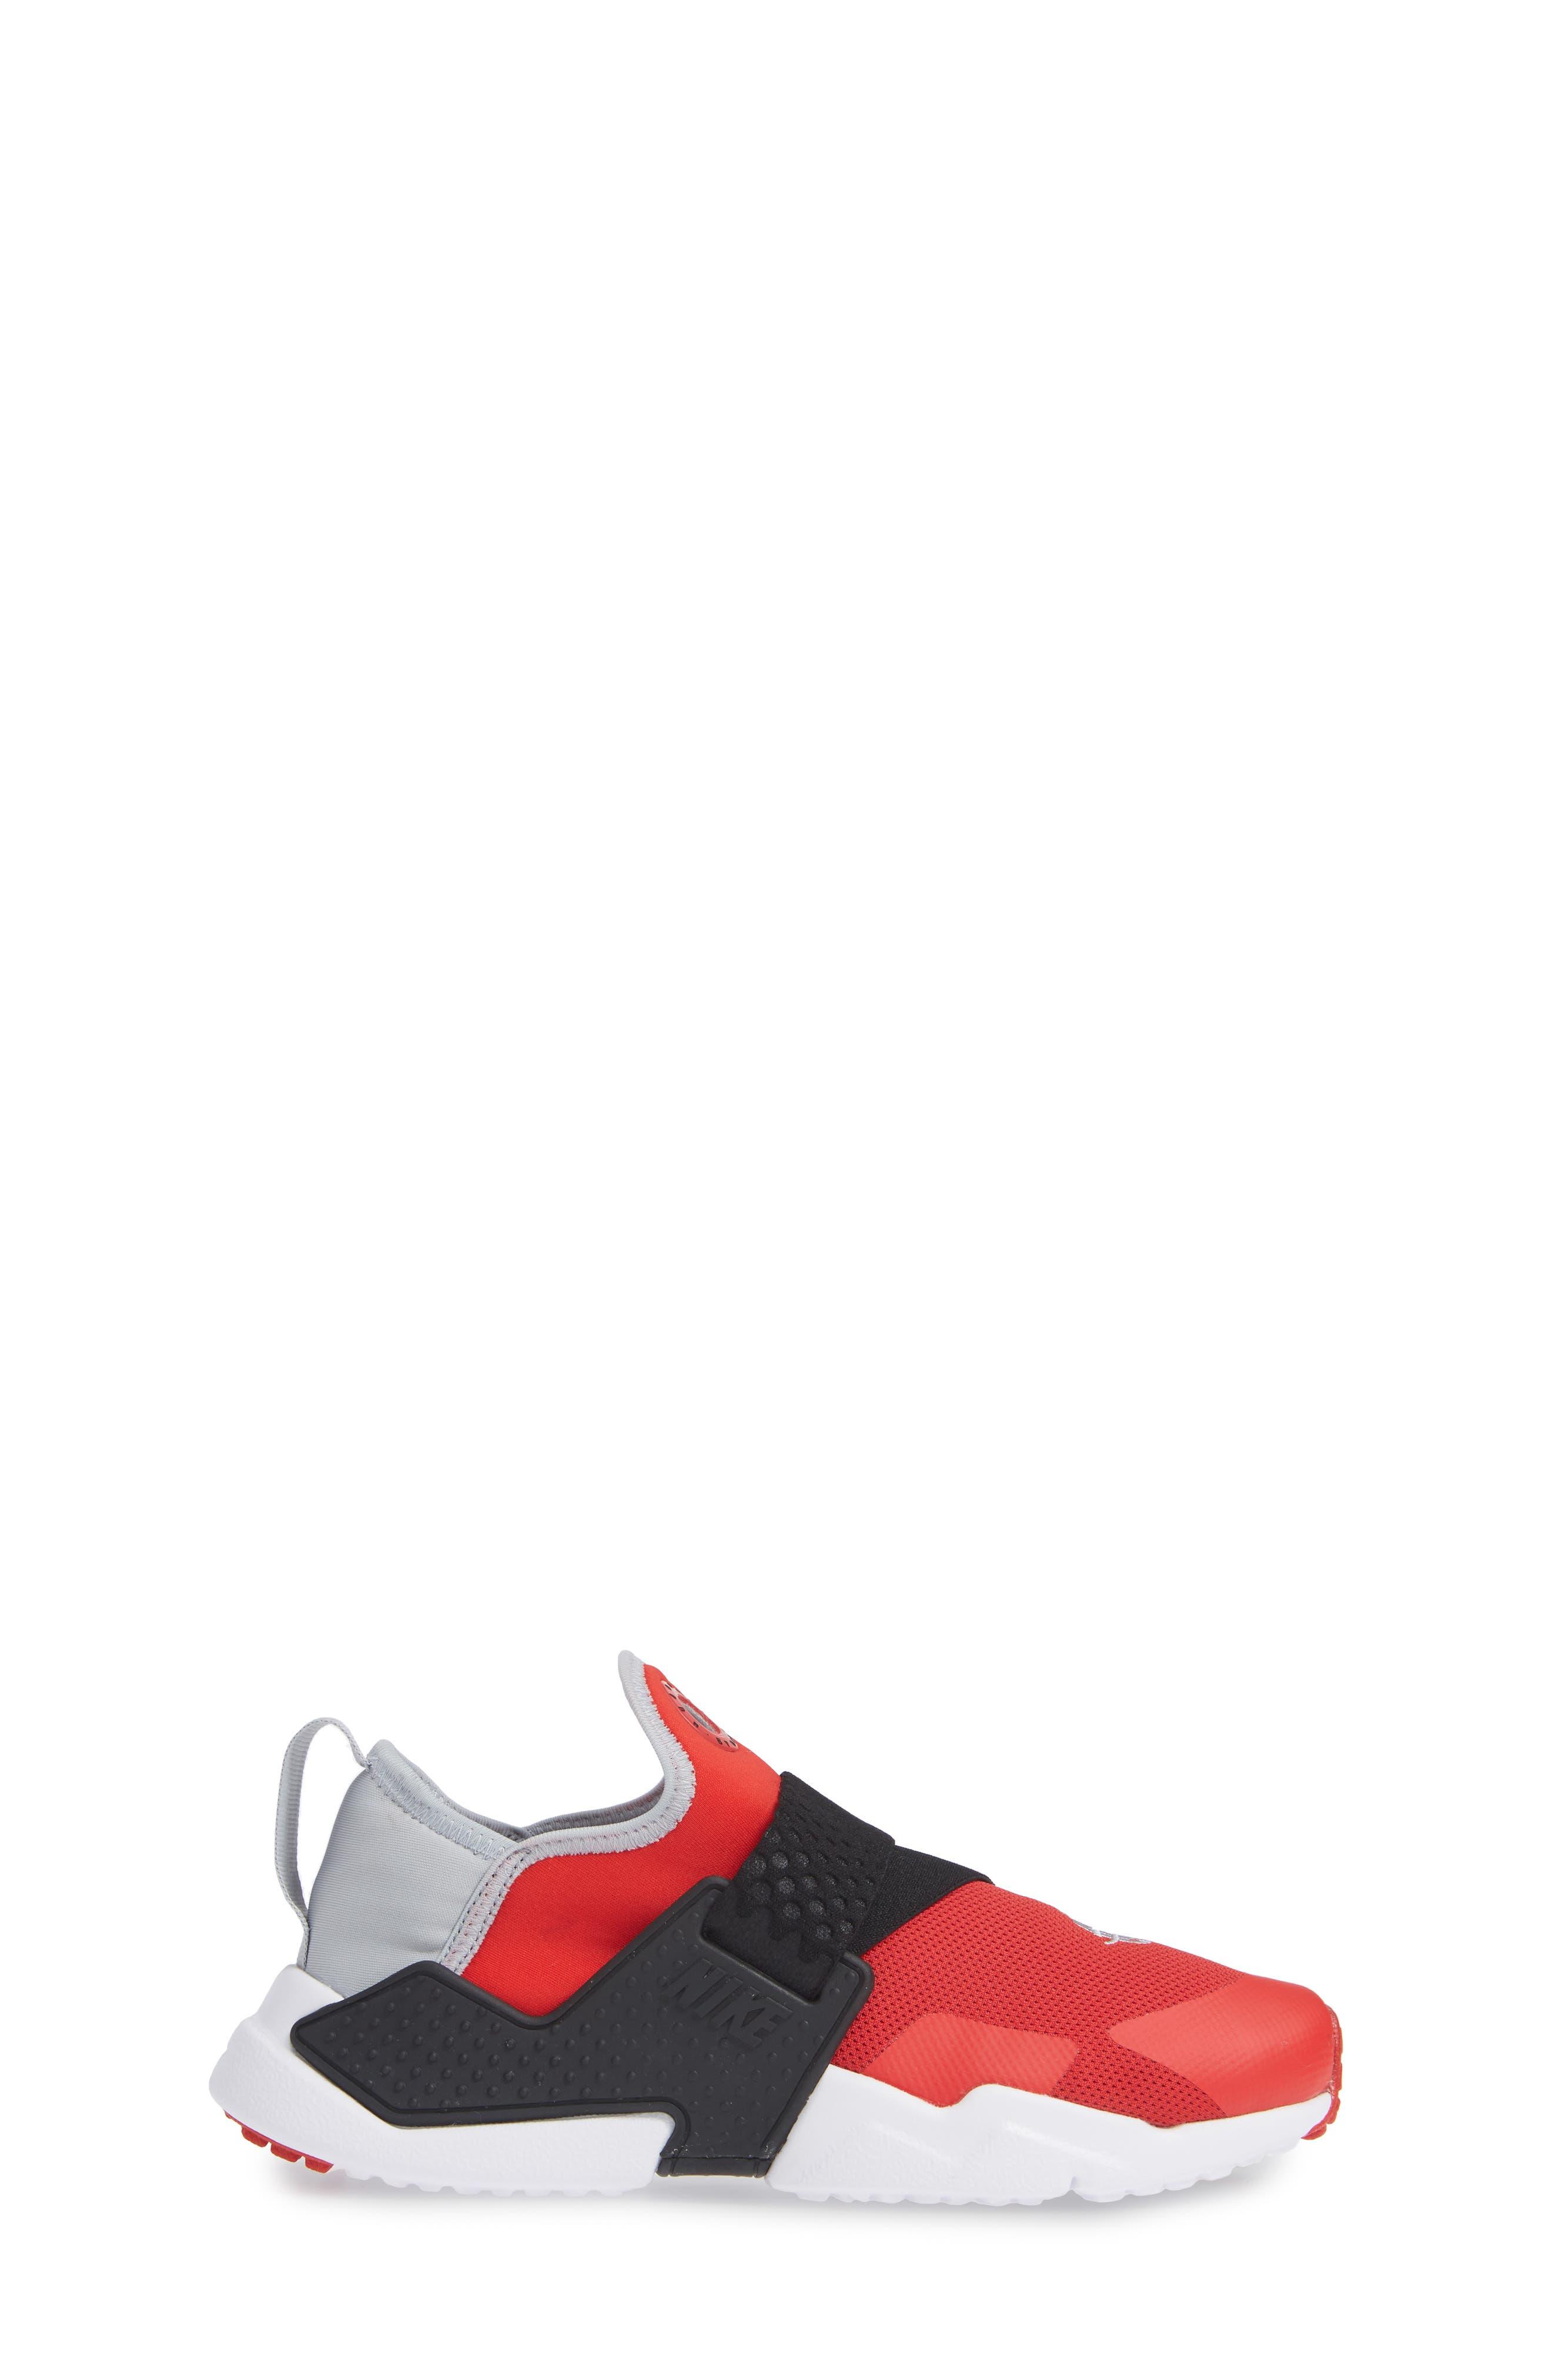 Huarache Extreme Sneaker,                             Alternate thumbnail 3, color,                             RED/ GREY/ BLACK/ WHITE